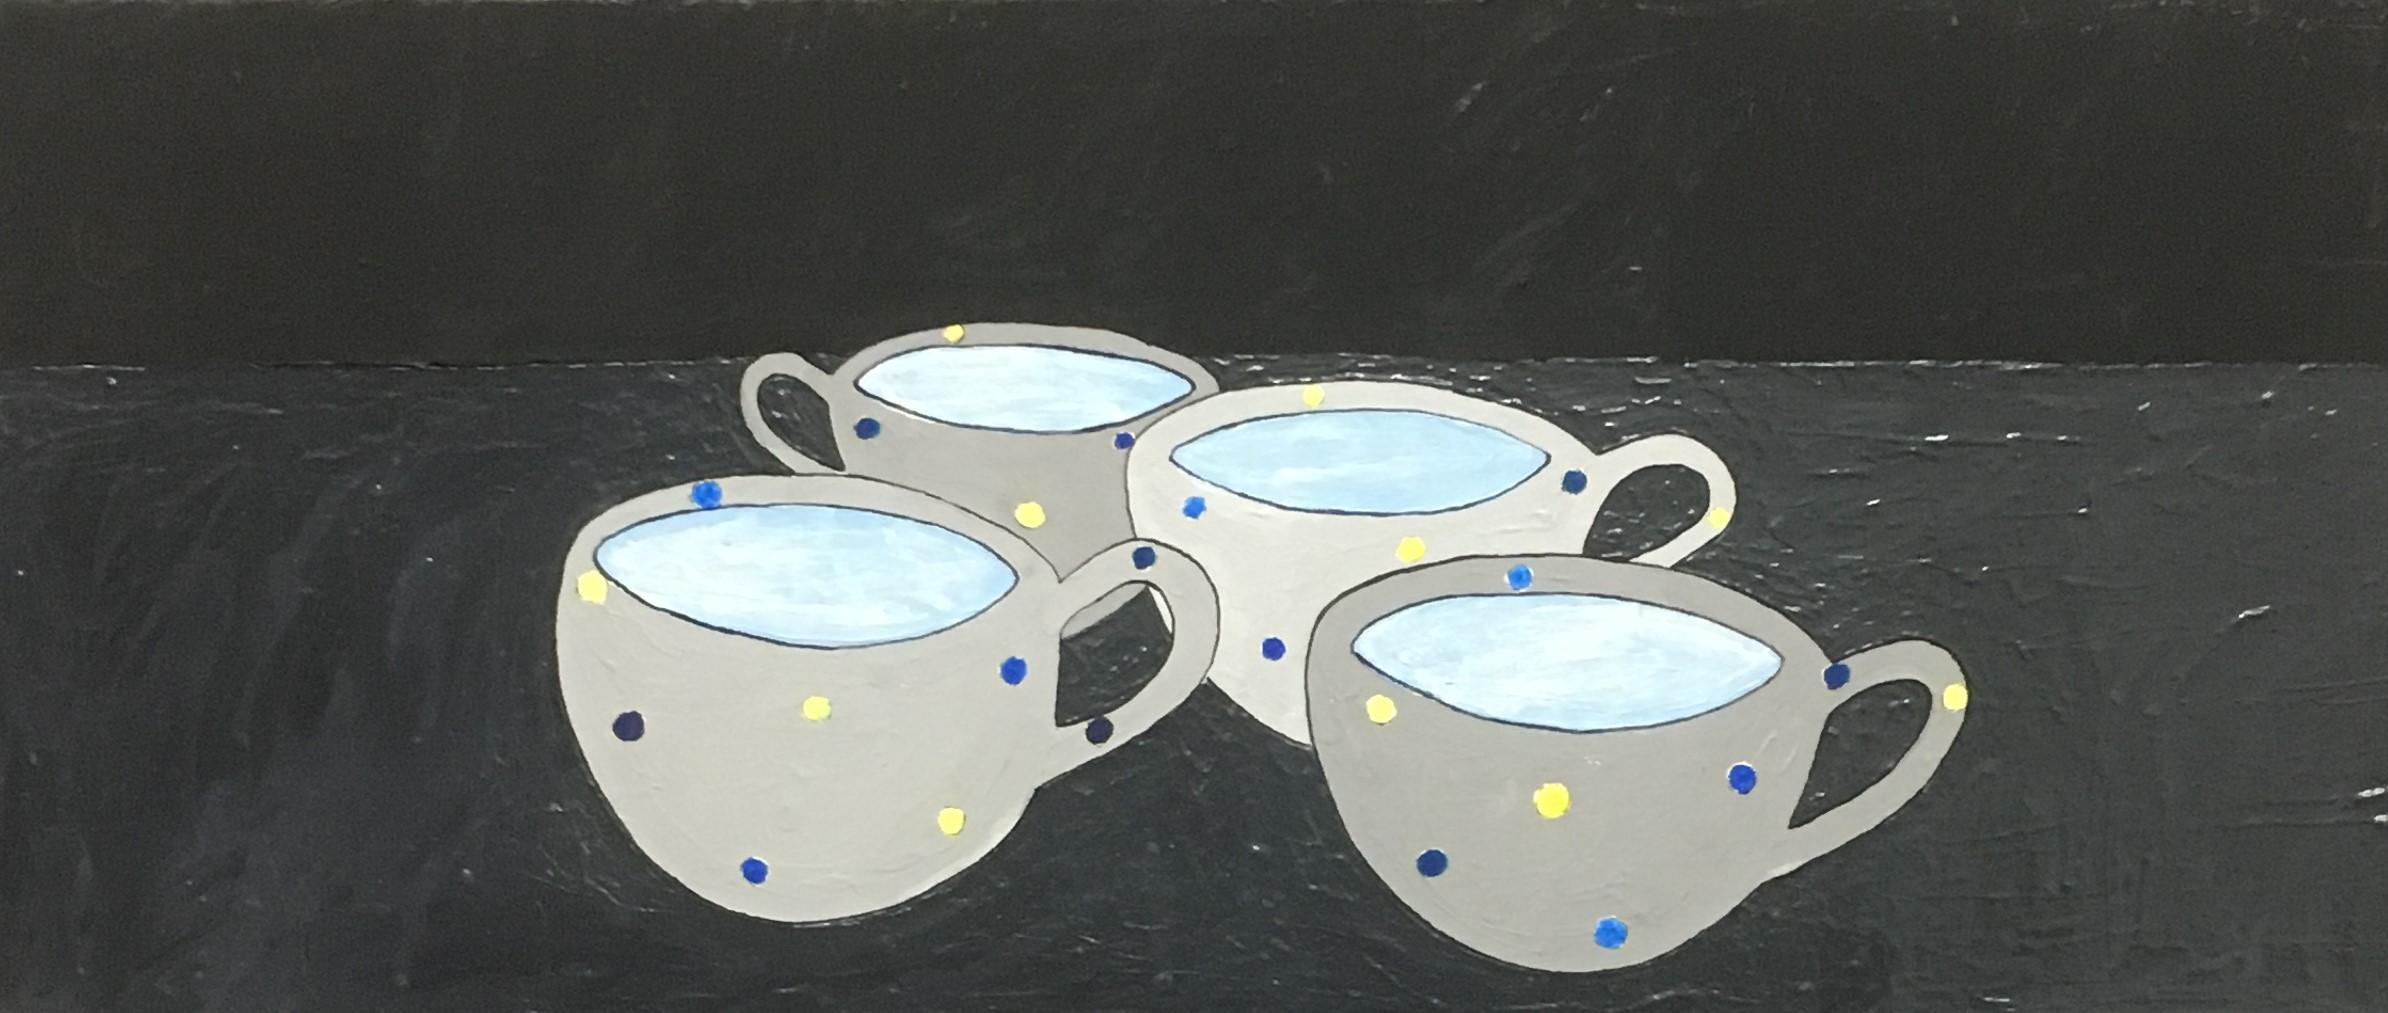 "Stephan Fritsch, ""4 Tassen"", 1991, Acryl auf Leinwand, 30 x 70 cm"